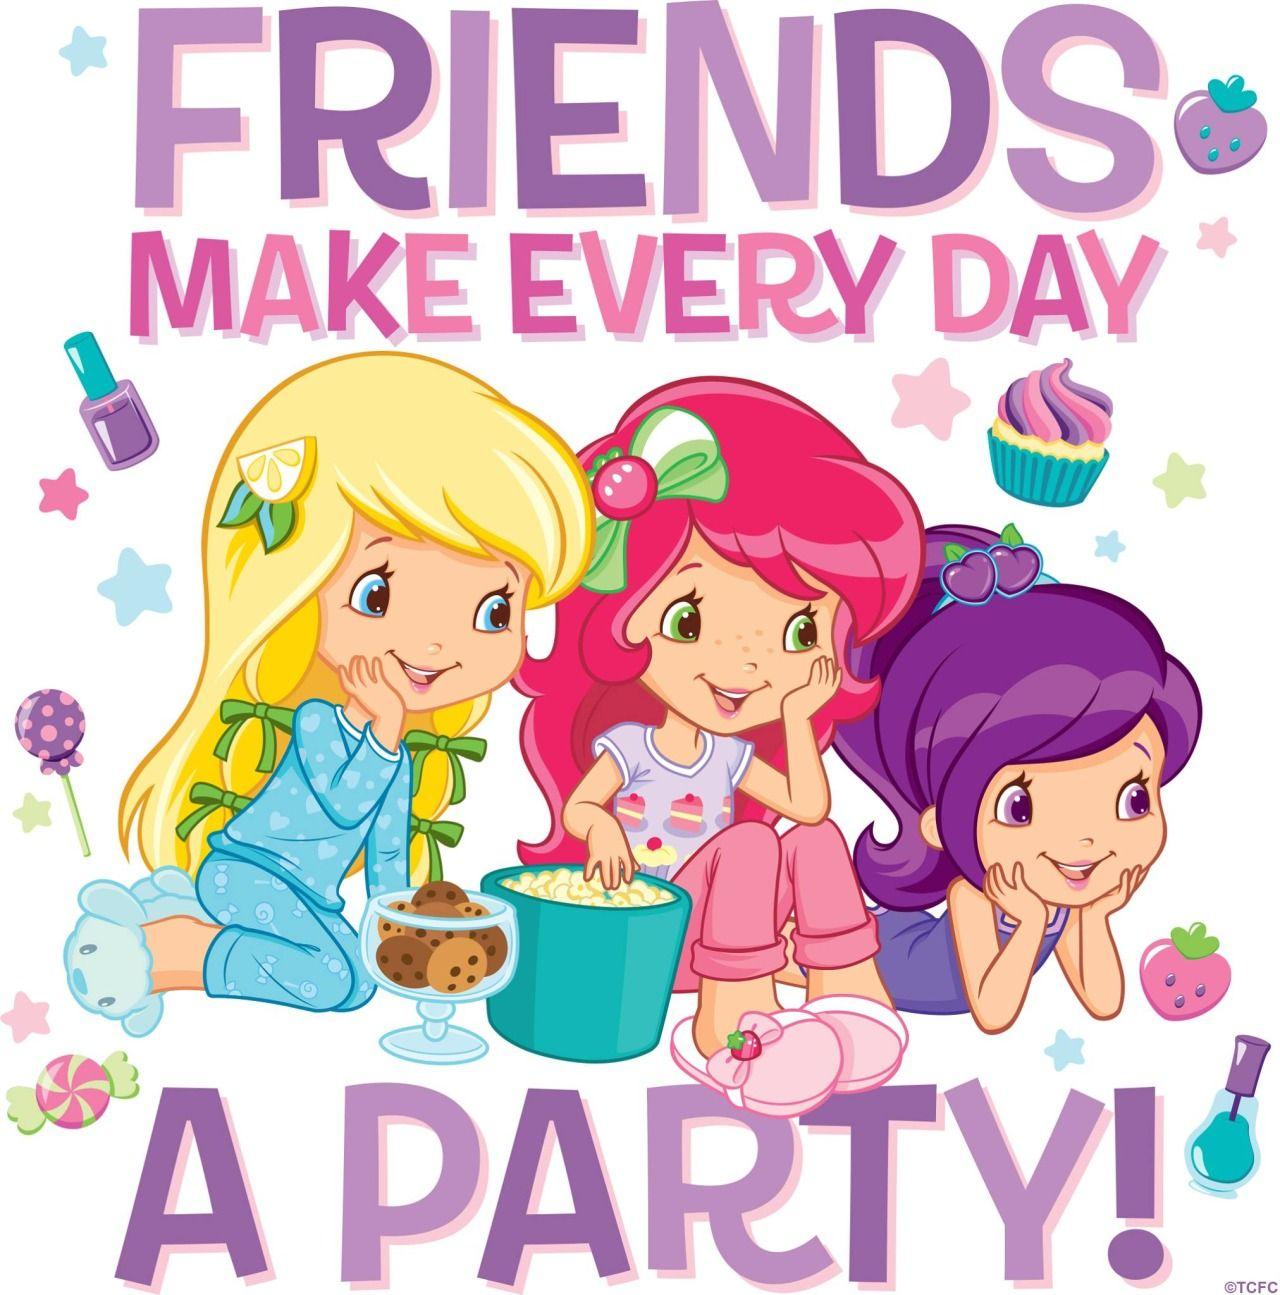 Pin de Darlene Christy en Friends Forever | Pinterest | Sublimacion ...